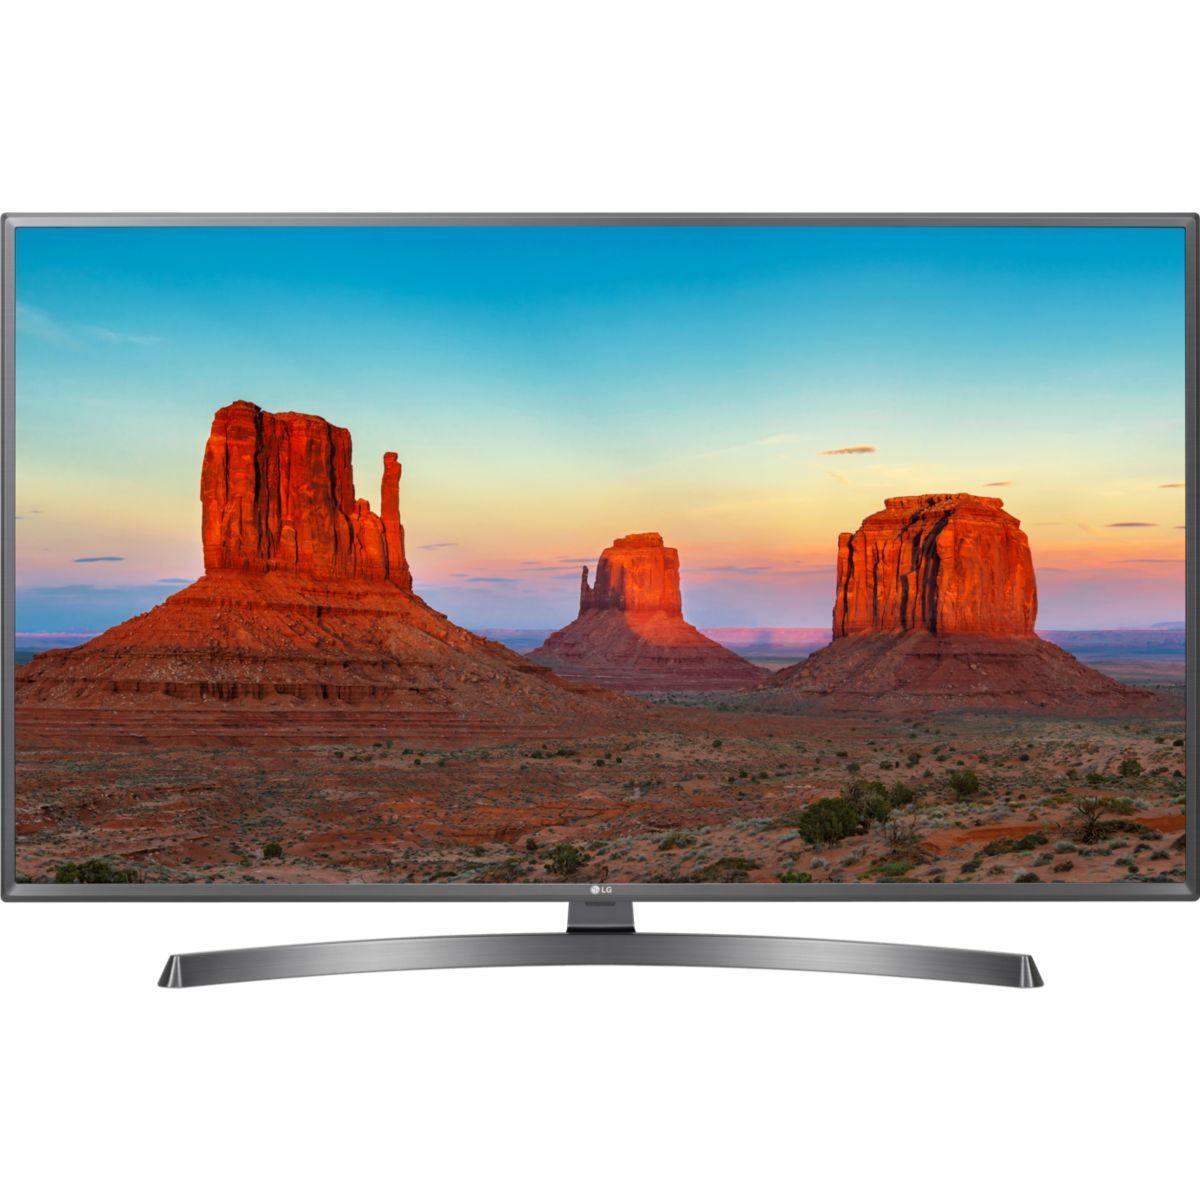 Tv led lg 43uk6750 - livraison offerte : code premium (photo)